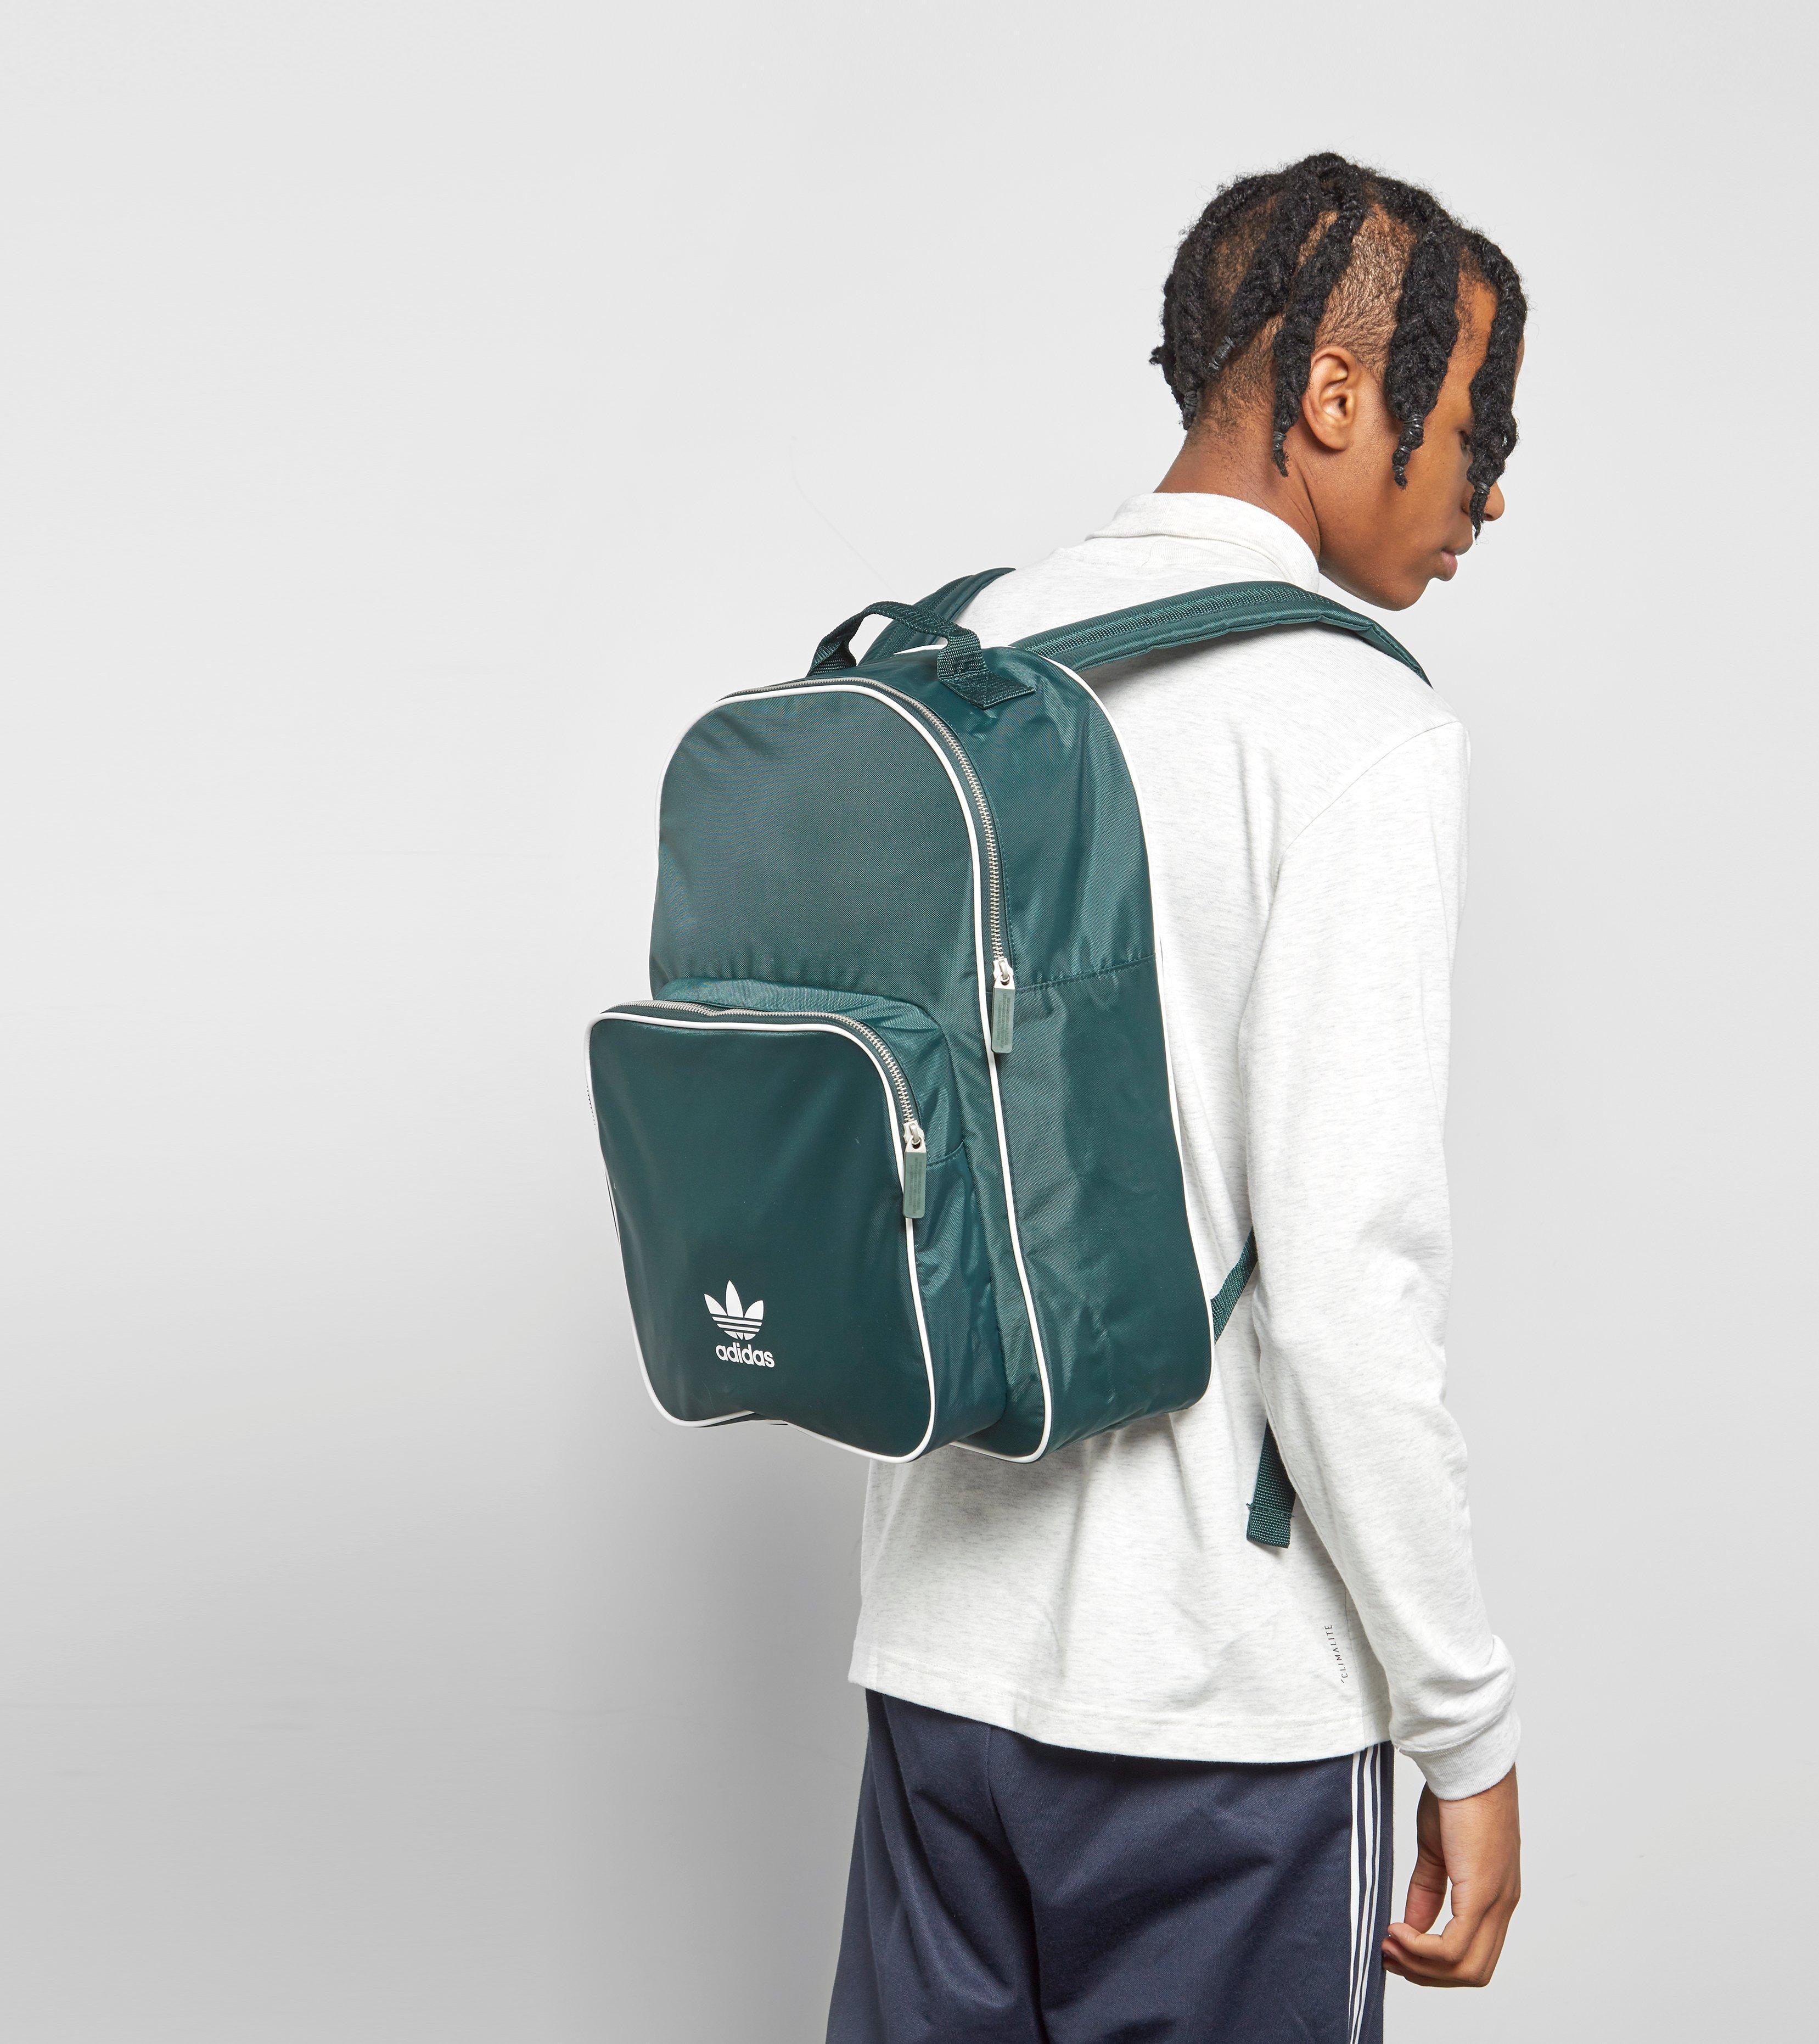 adidas Originals Adicolor Backpack in Green for Men - Lyst 67aabff3aefdd